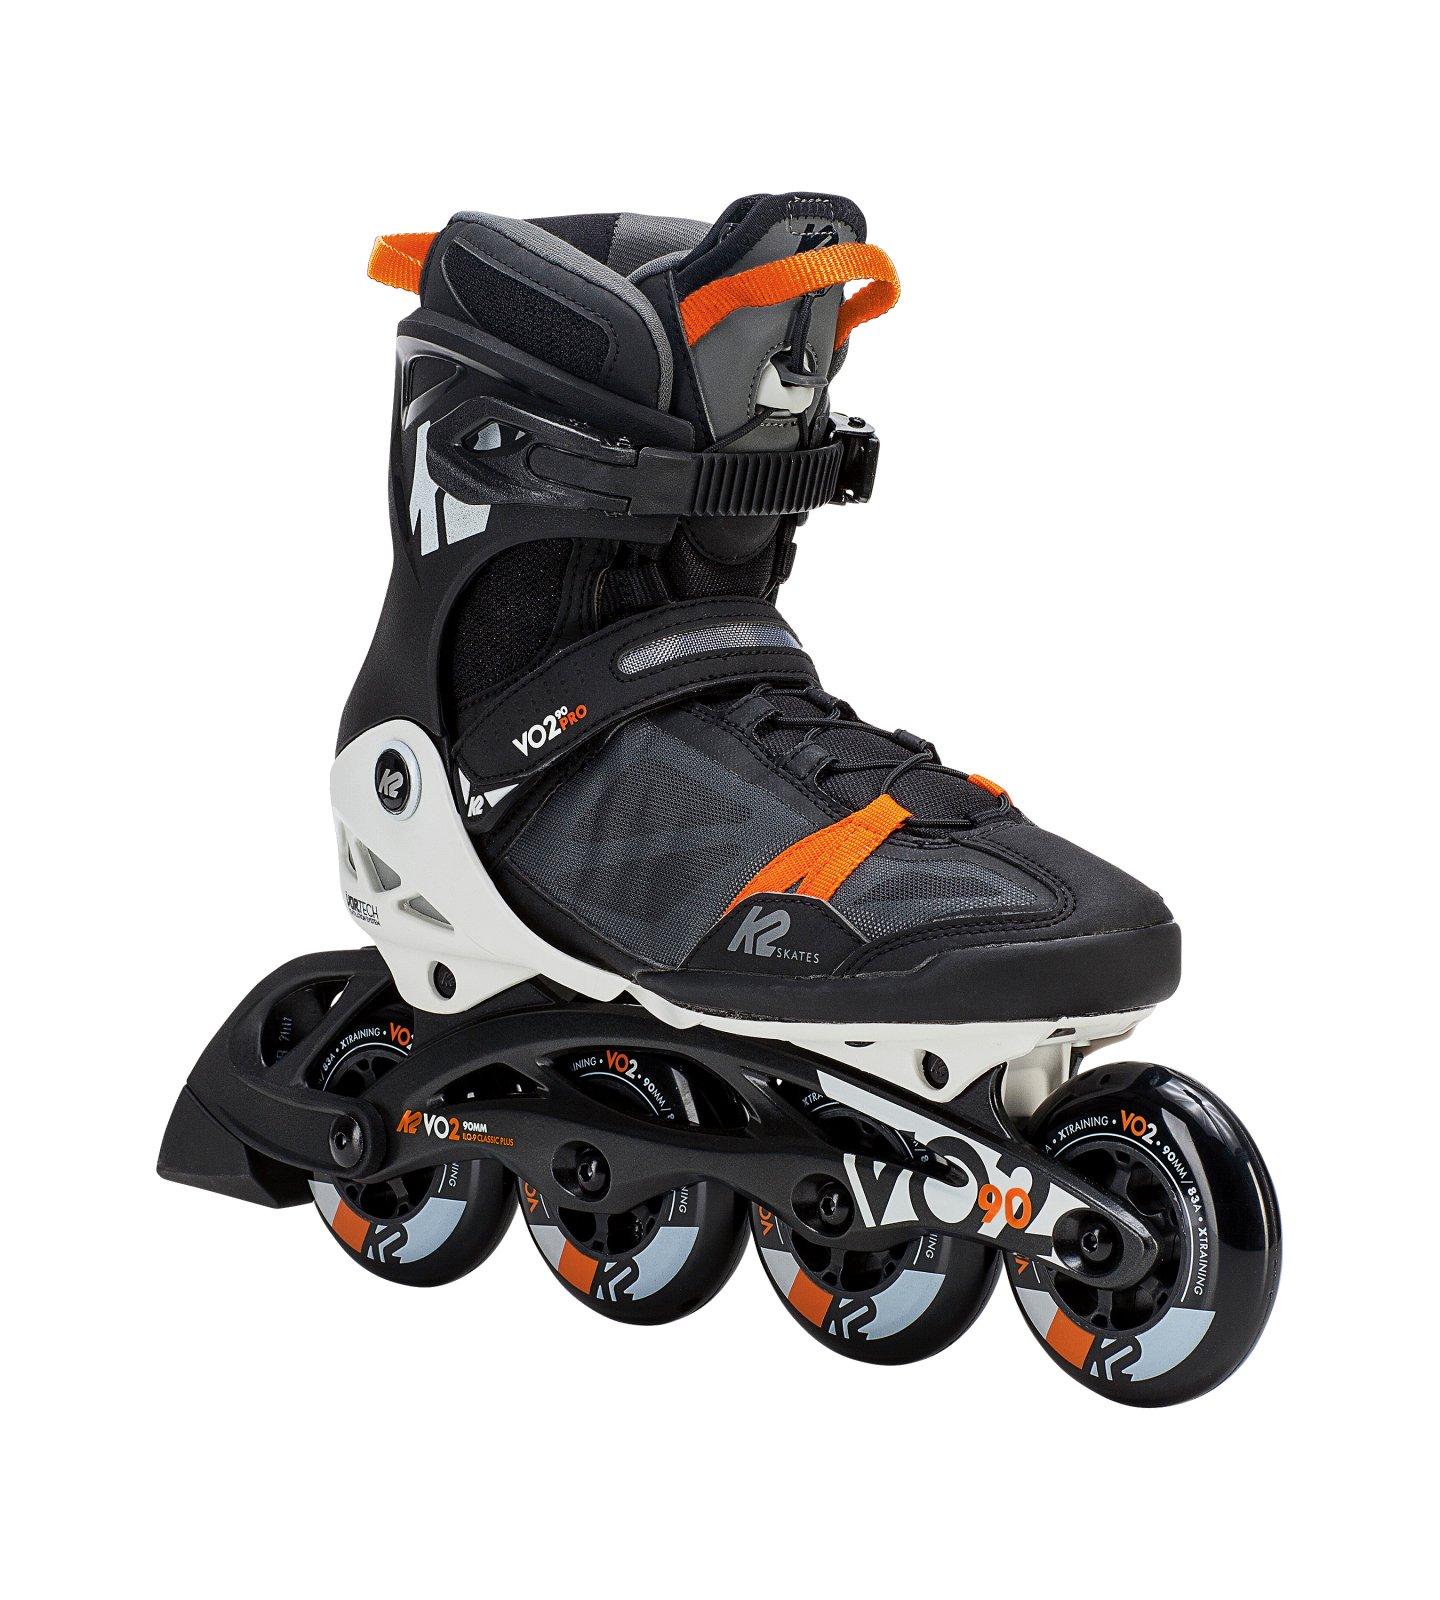 2019 K2 VO2 90 Pro Men's Inline Skates